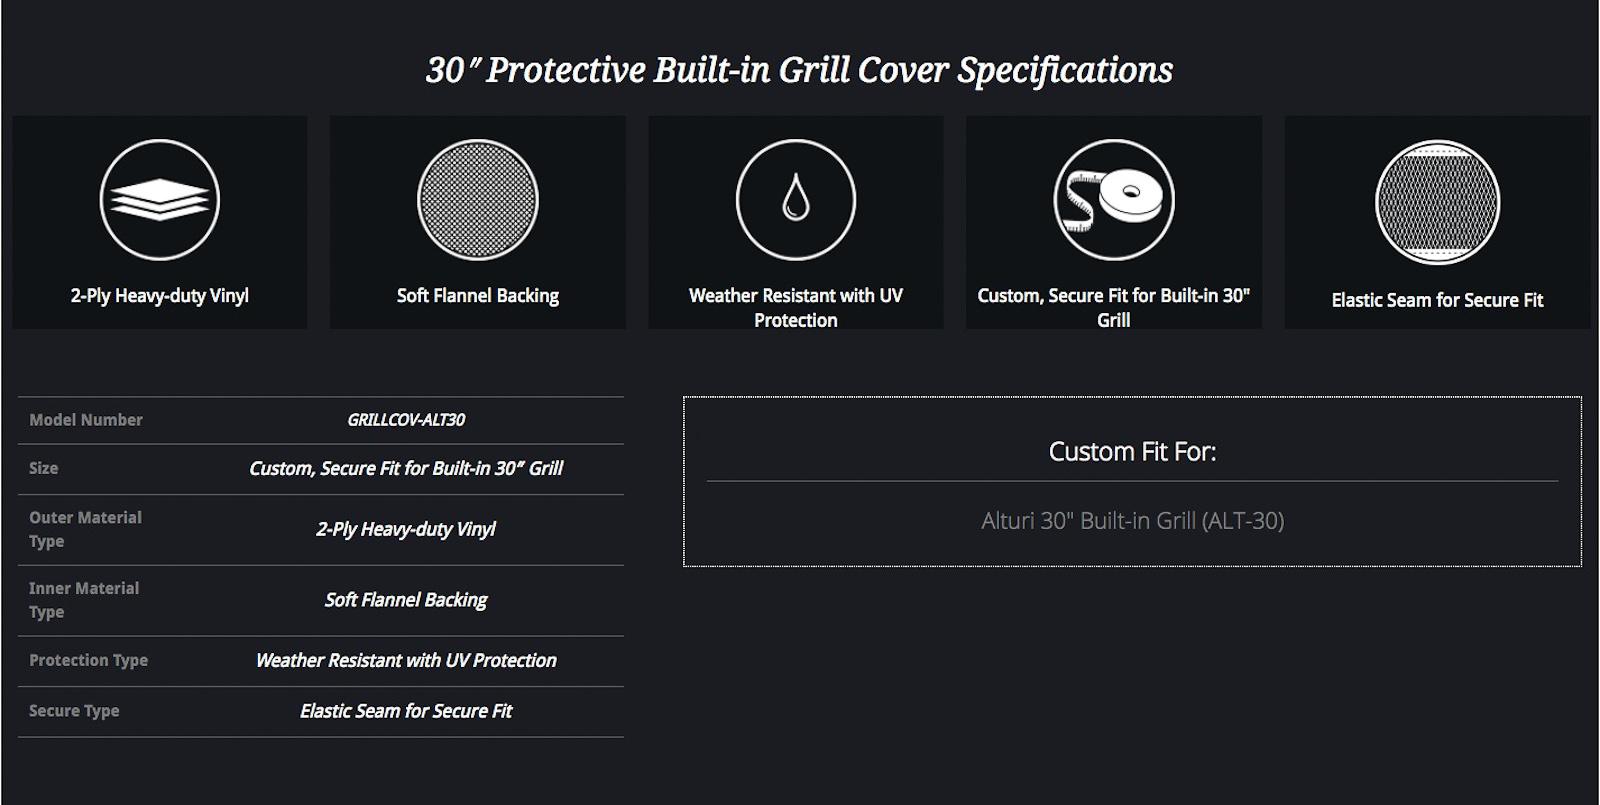 summerset-alturi-30-22-built-in-deluxe-grill-cover-grillcov-alt30d.jpg